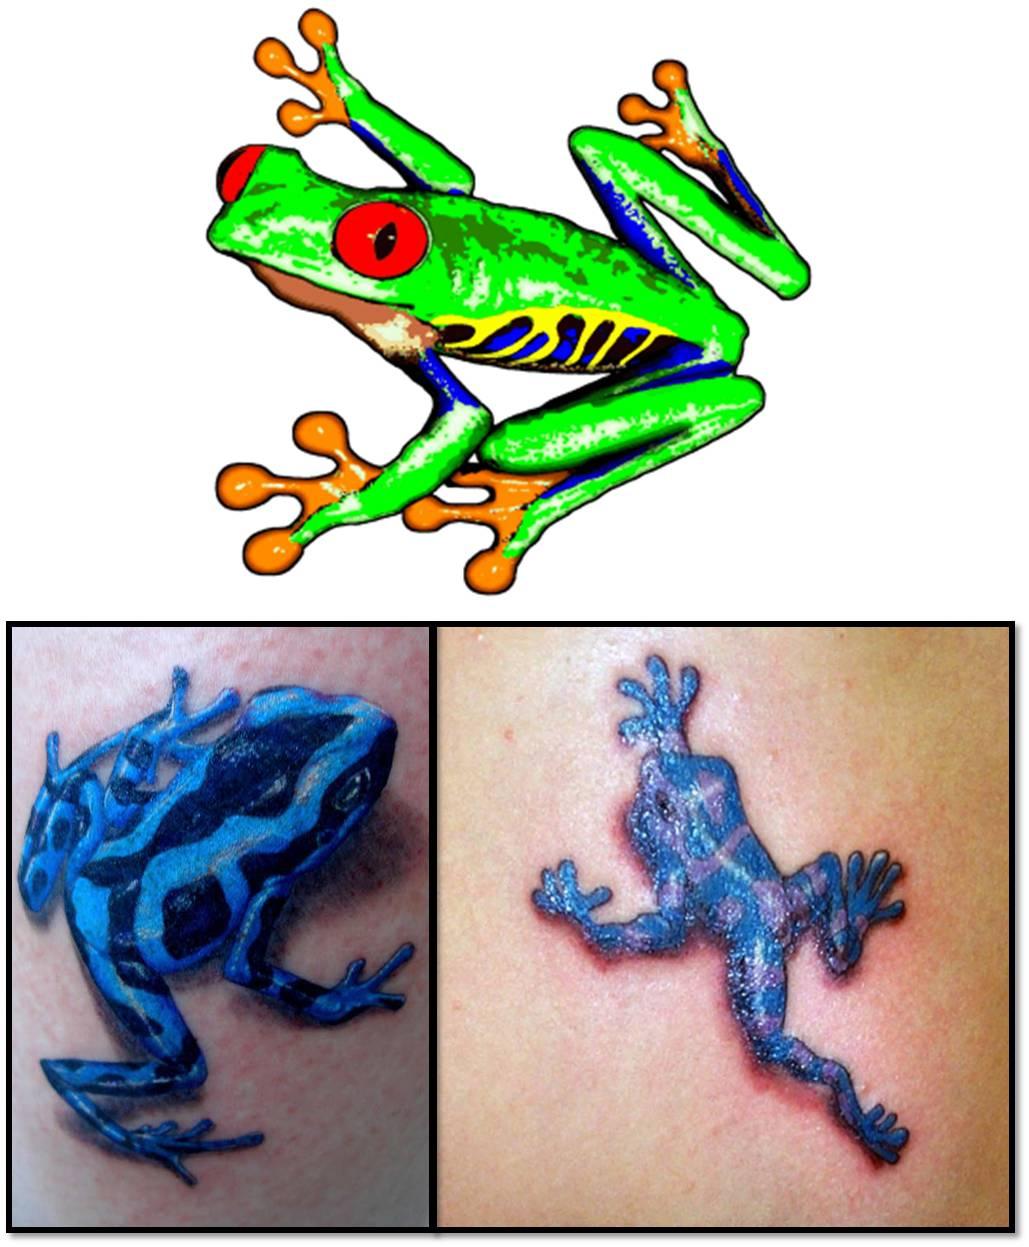 trend tattoos frog tattoos. Black Bedroom Furniture Sets. Home Design Ideas